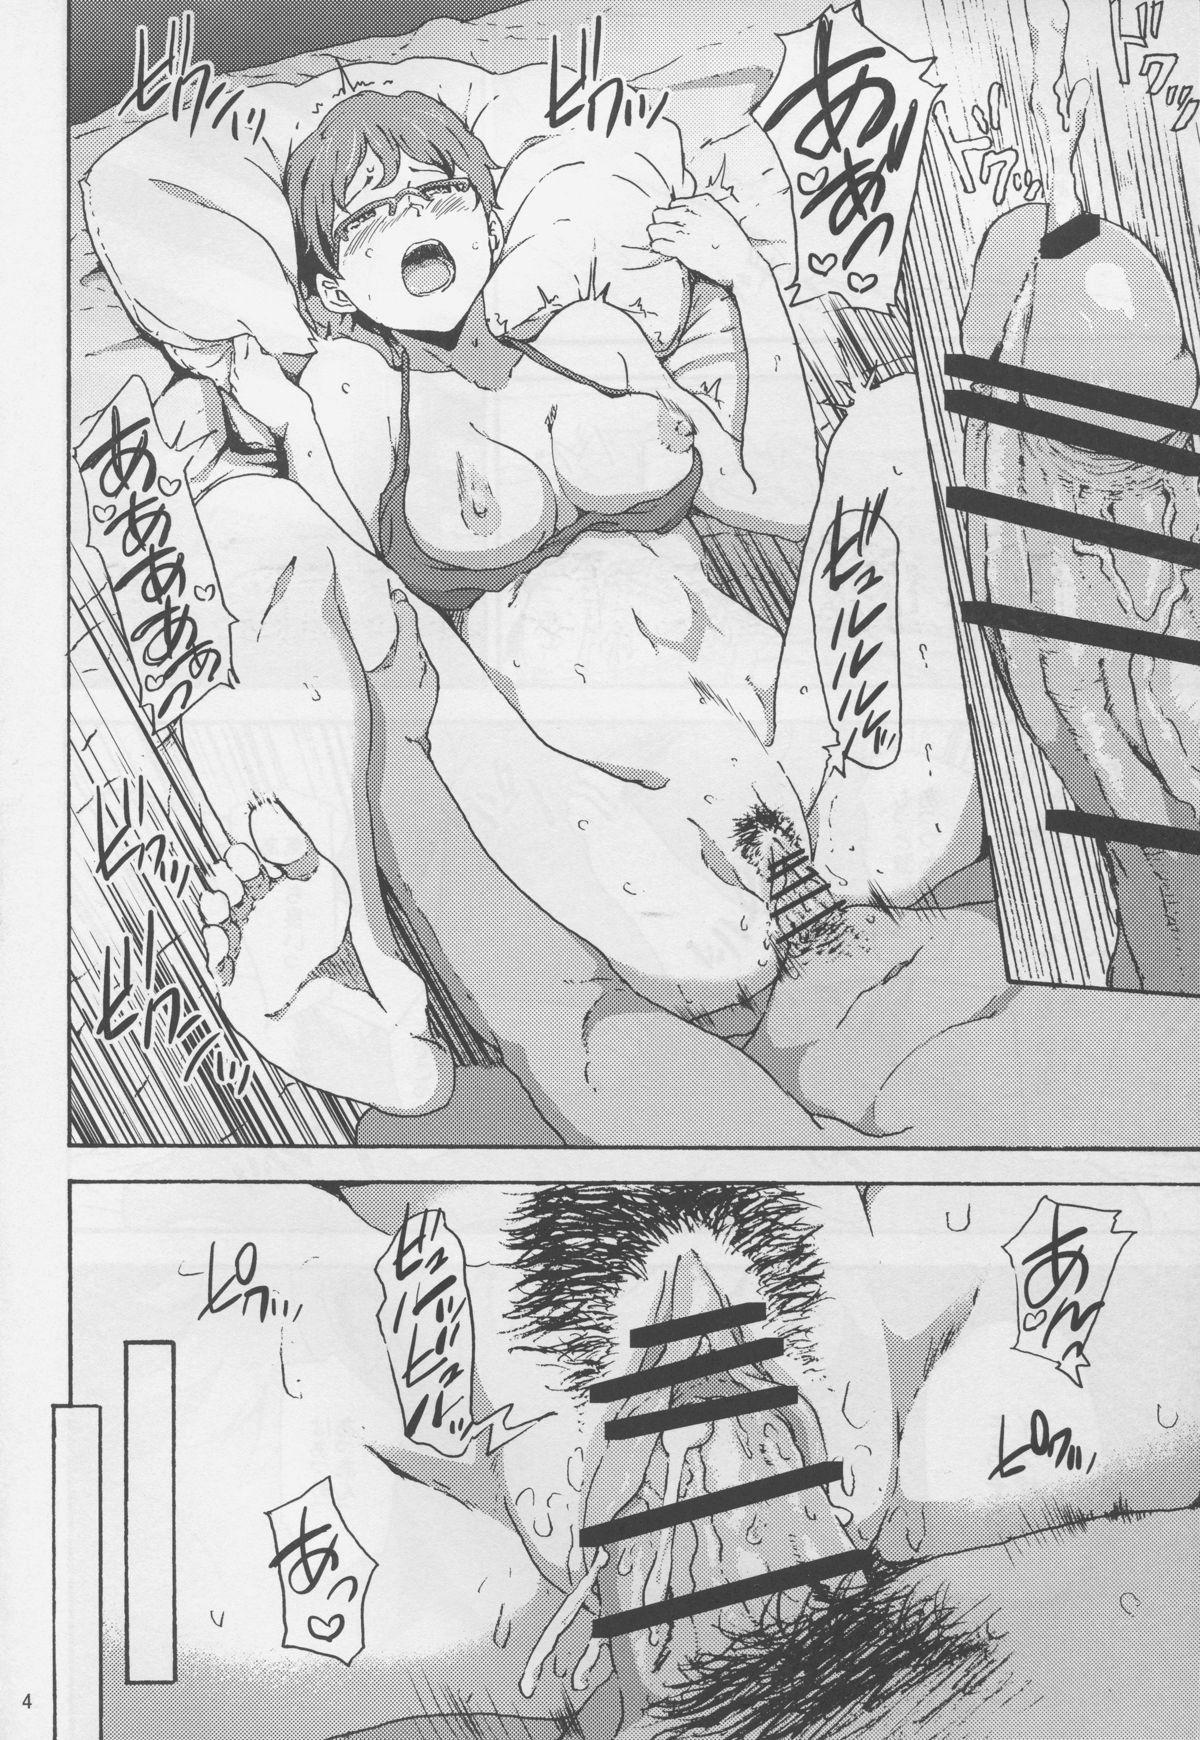 Mirai-chan ga Sandaime SGOCK no Leader ni Damasare Yarechau Hon 3